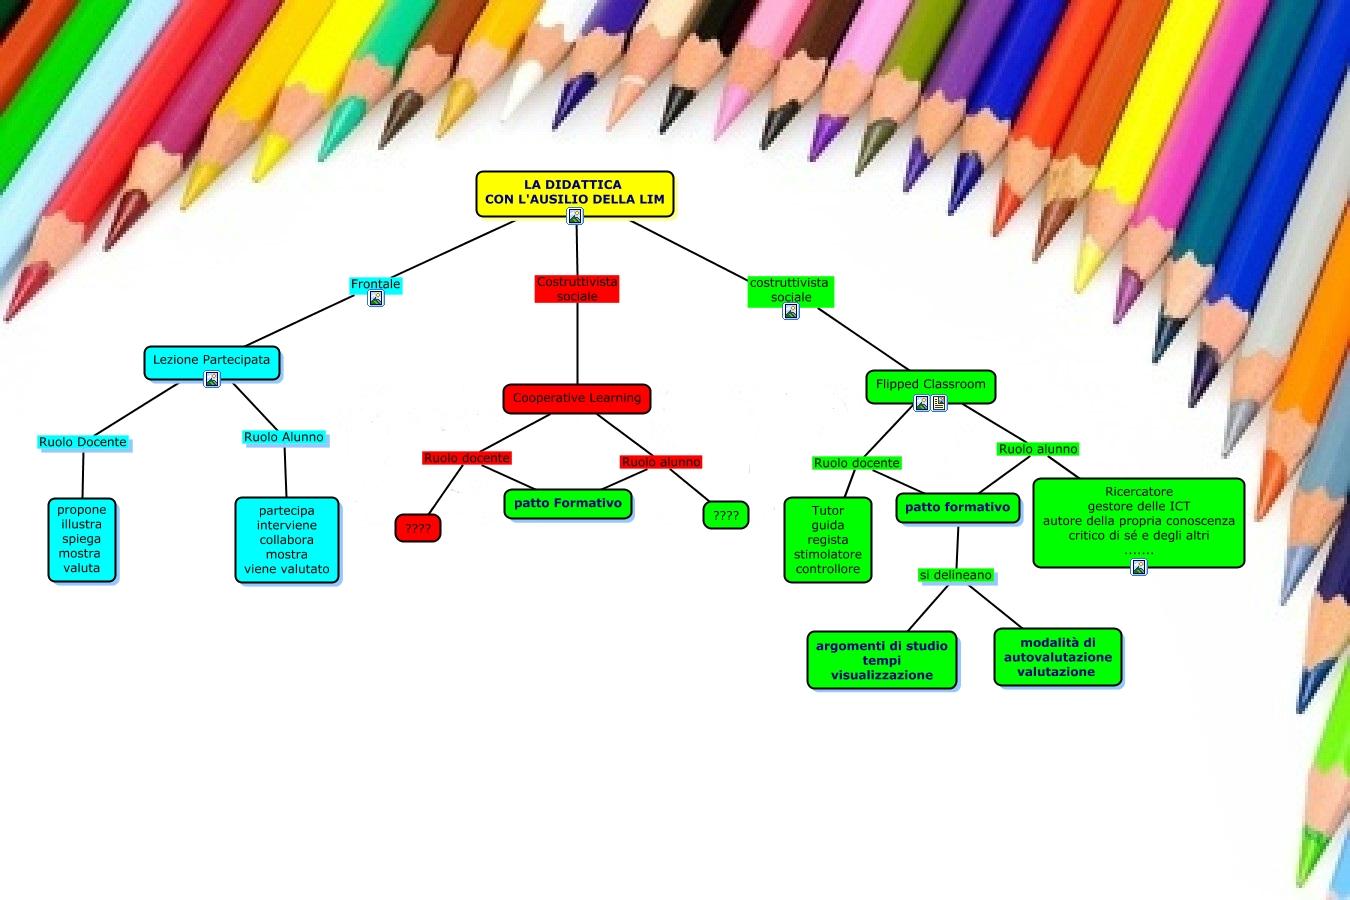 Metodologie Didattiche Innovative Flipped Classroom : Didattica lim quali metodologie didattiche prevede l uso